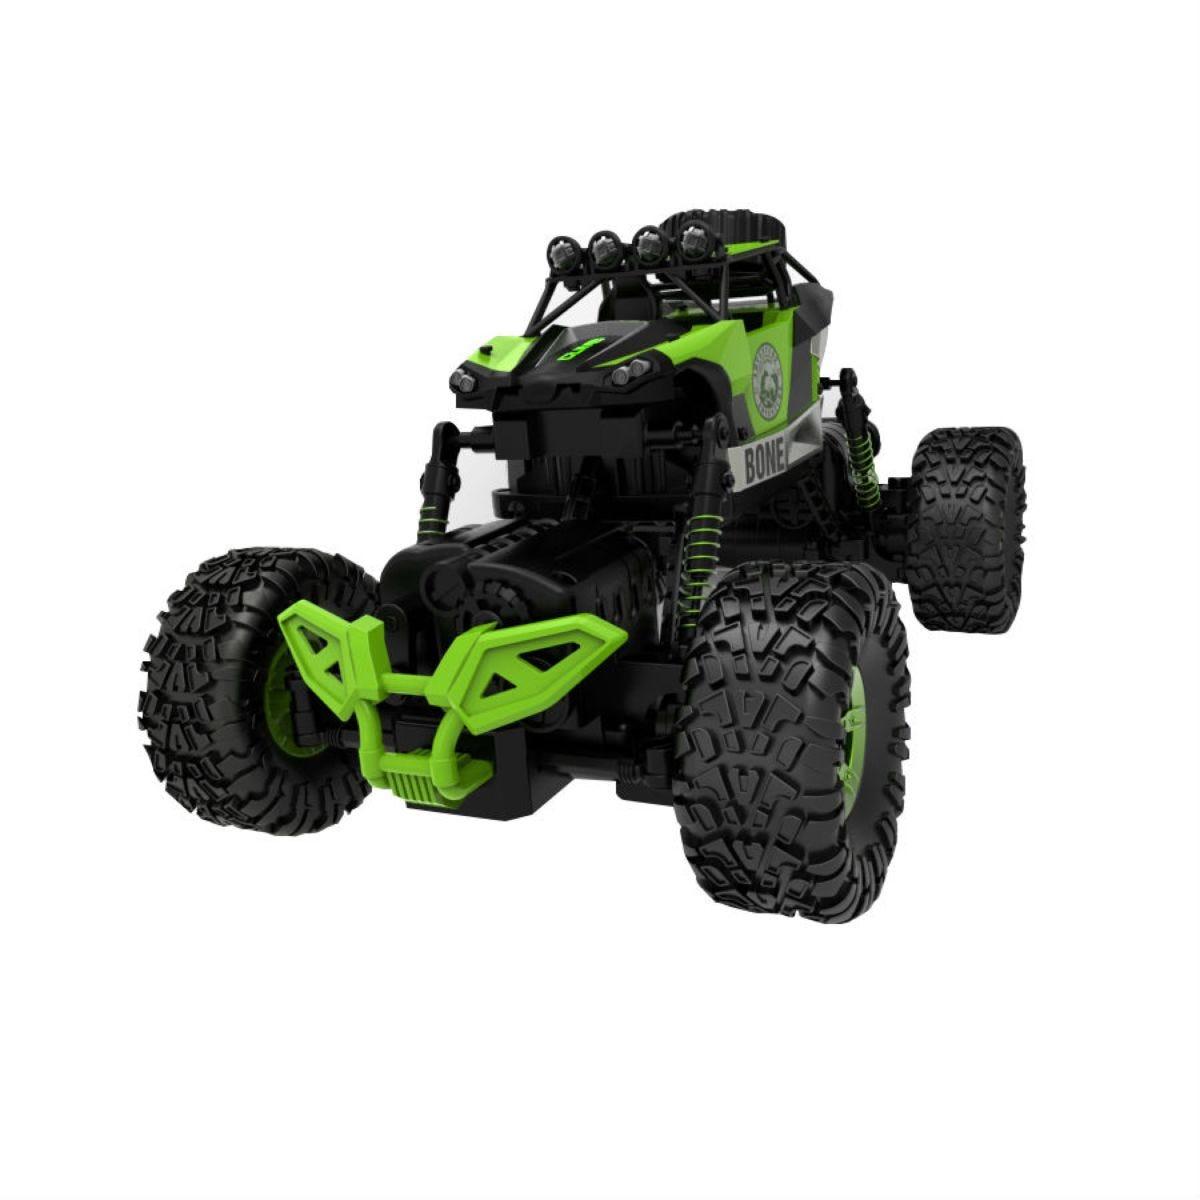 Rock Crawler 1:18 Scale Remote Control Car